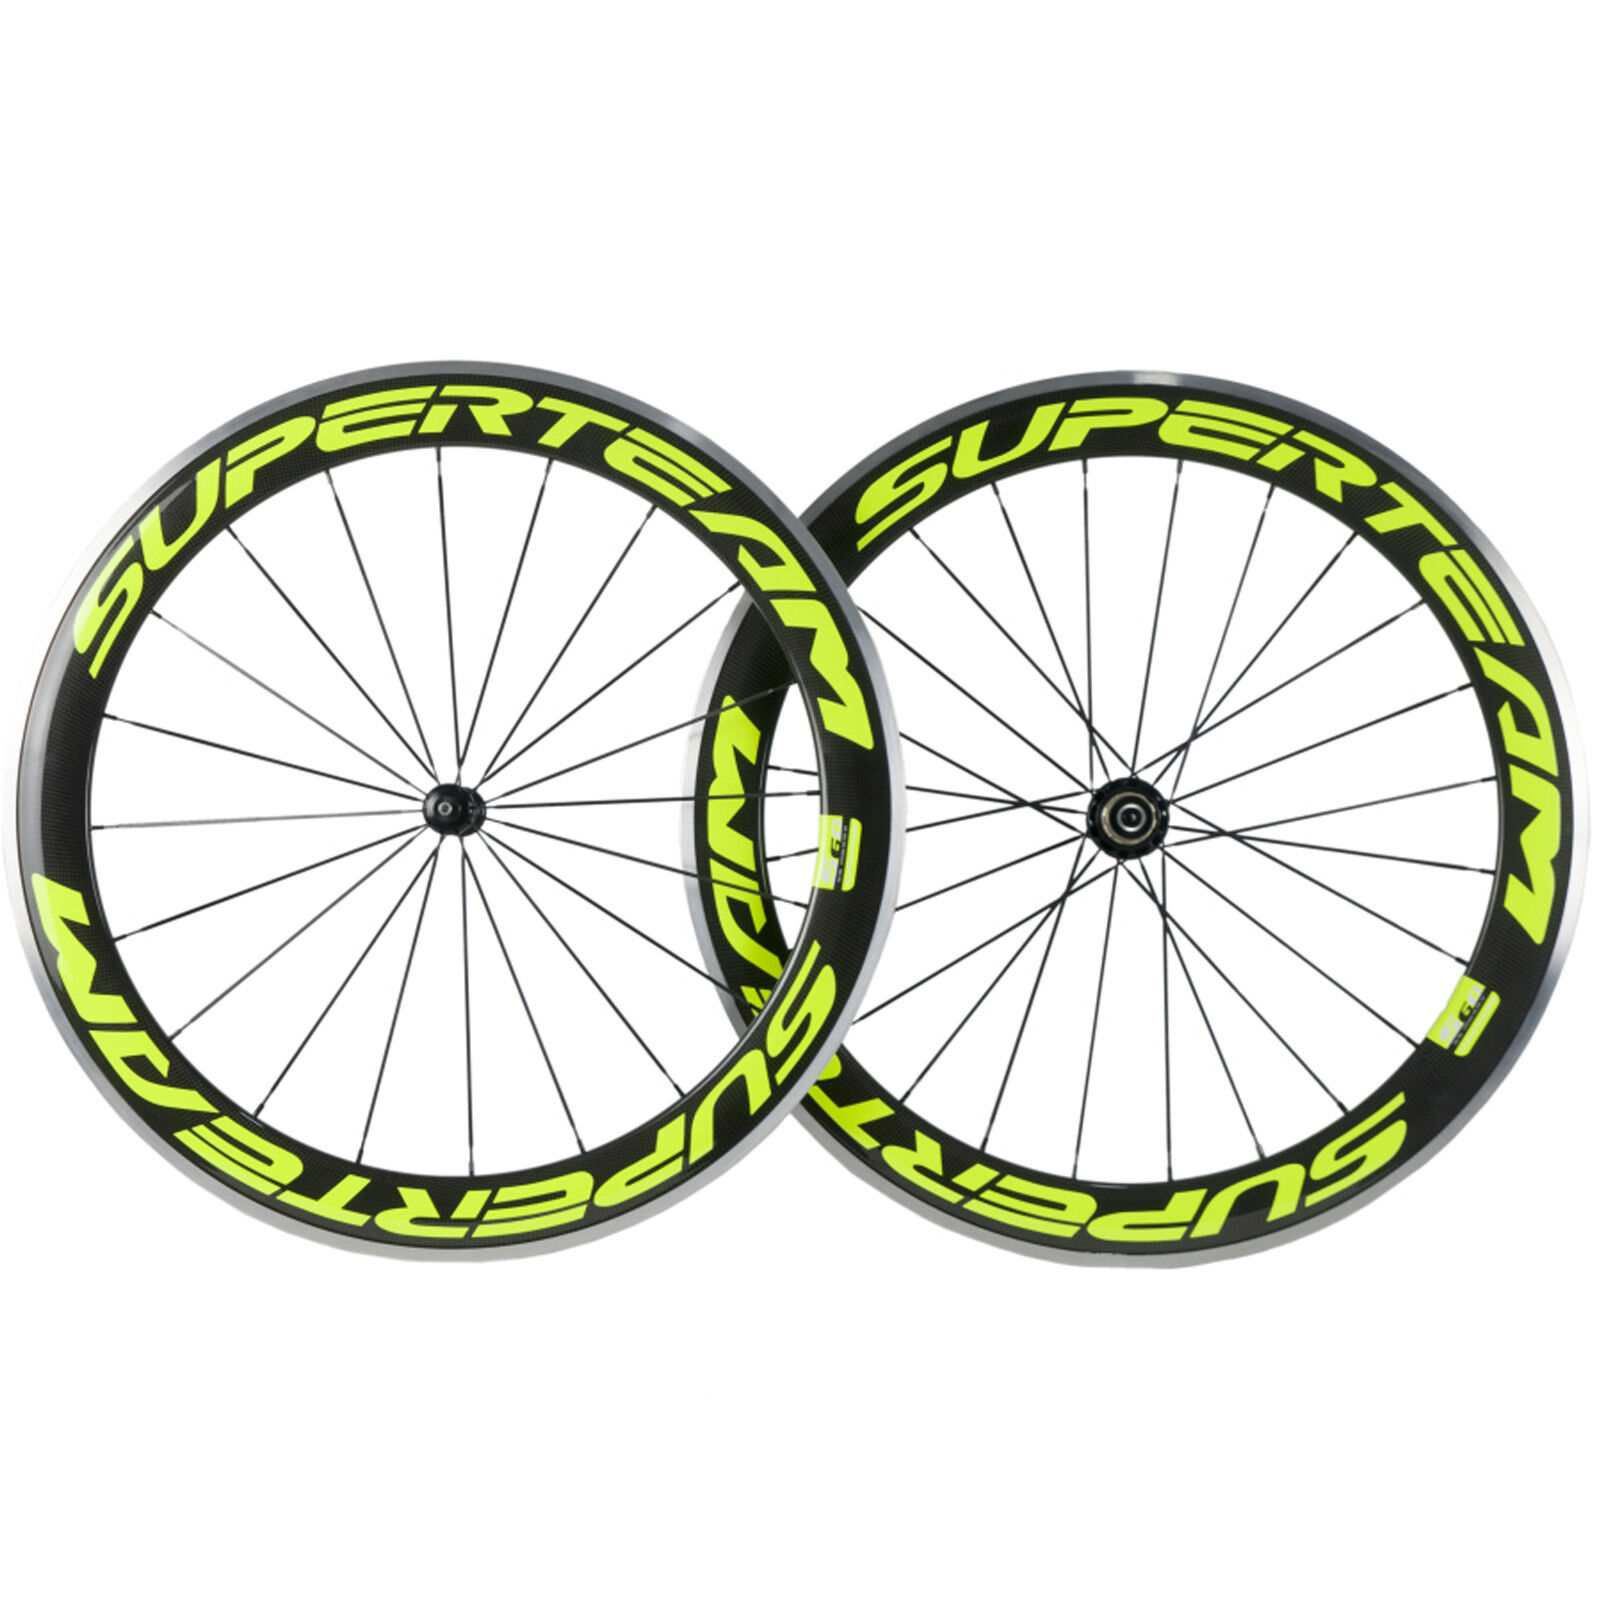 Superteam Alloy Carbon Wheels  50mm Carbon Bike Aluminum Wheelset 700c Clincher  buy brand